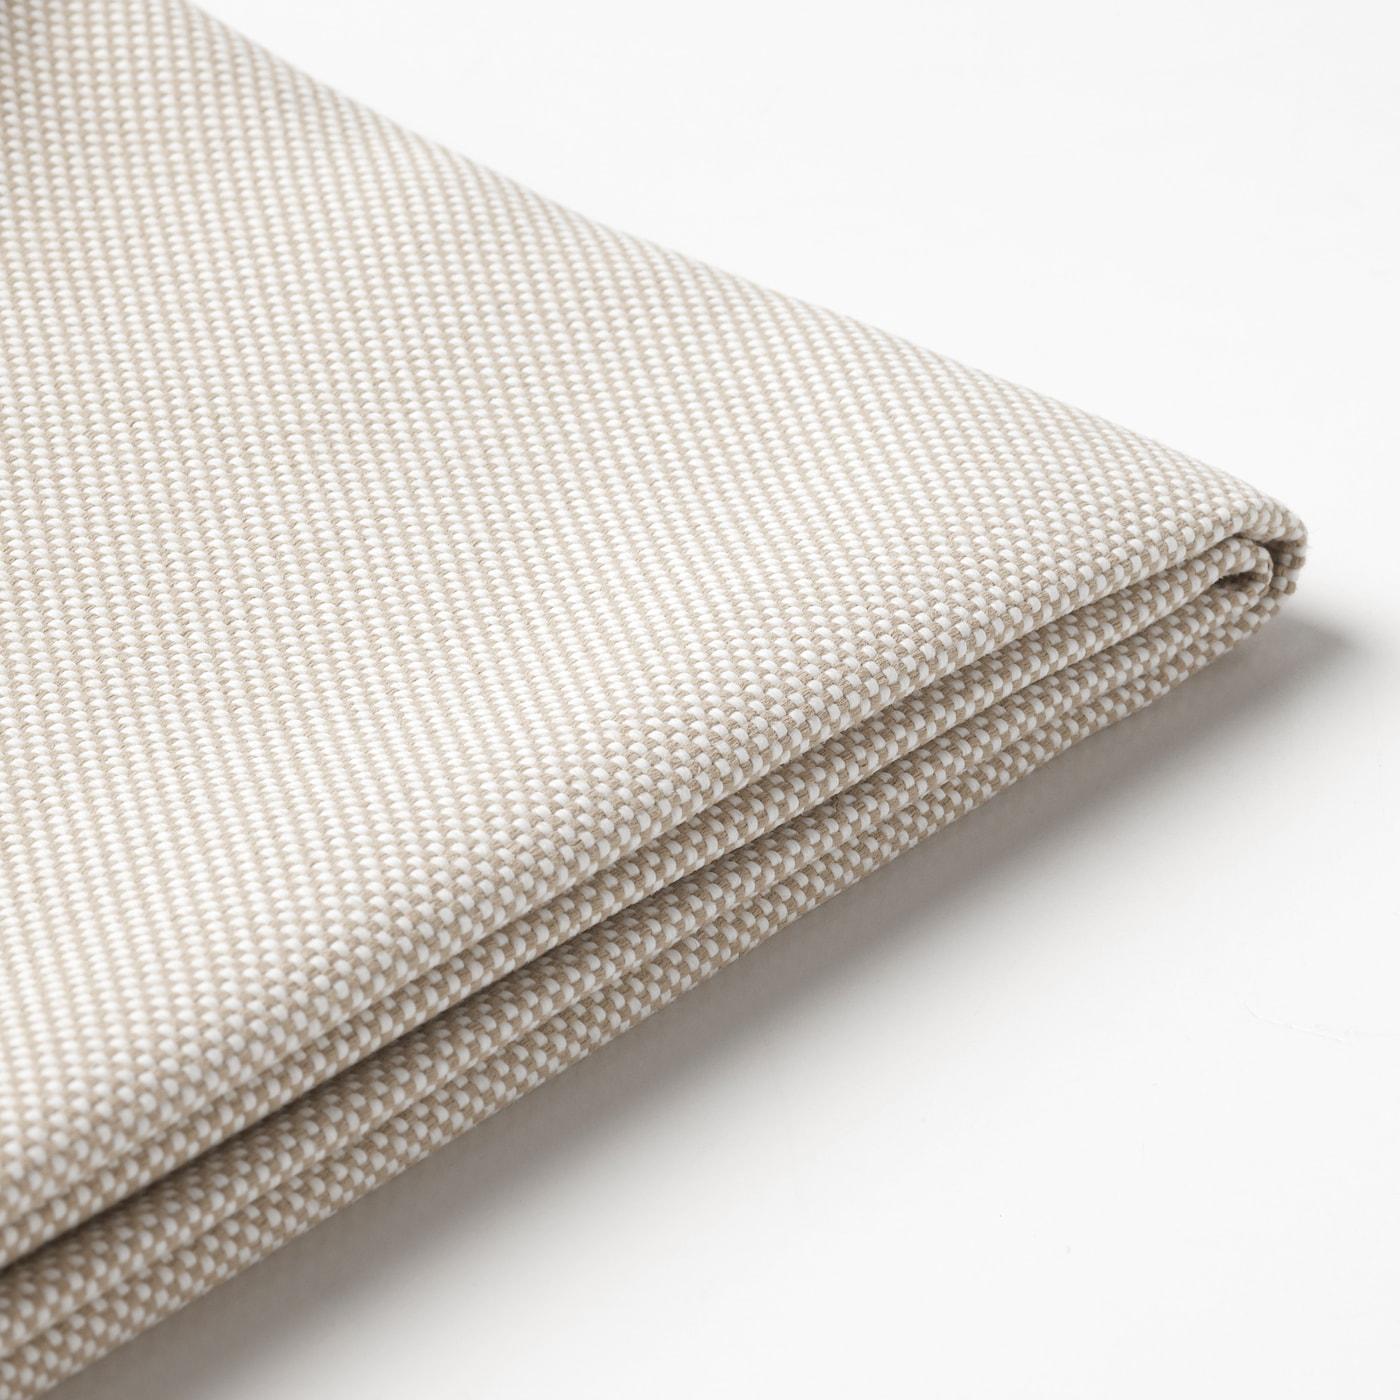 FRÖSÖN Cover for seat cushion, outdoor beige, 62x62 cm